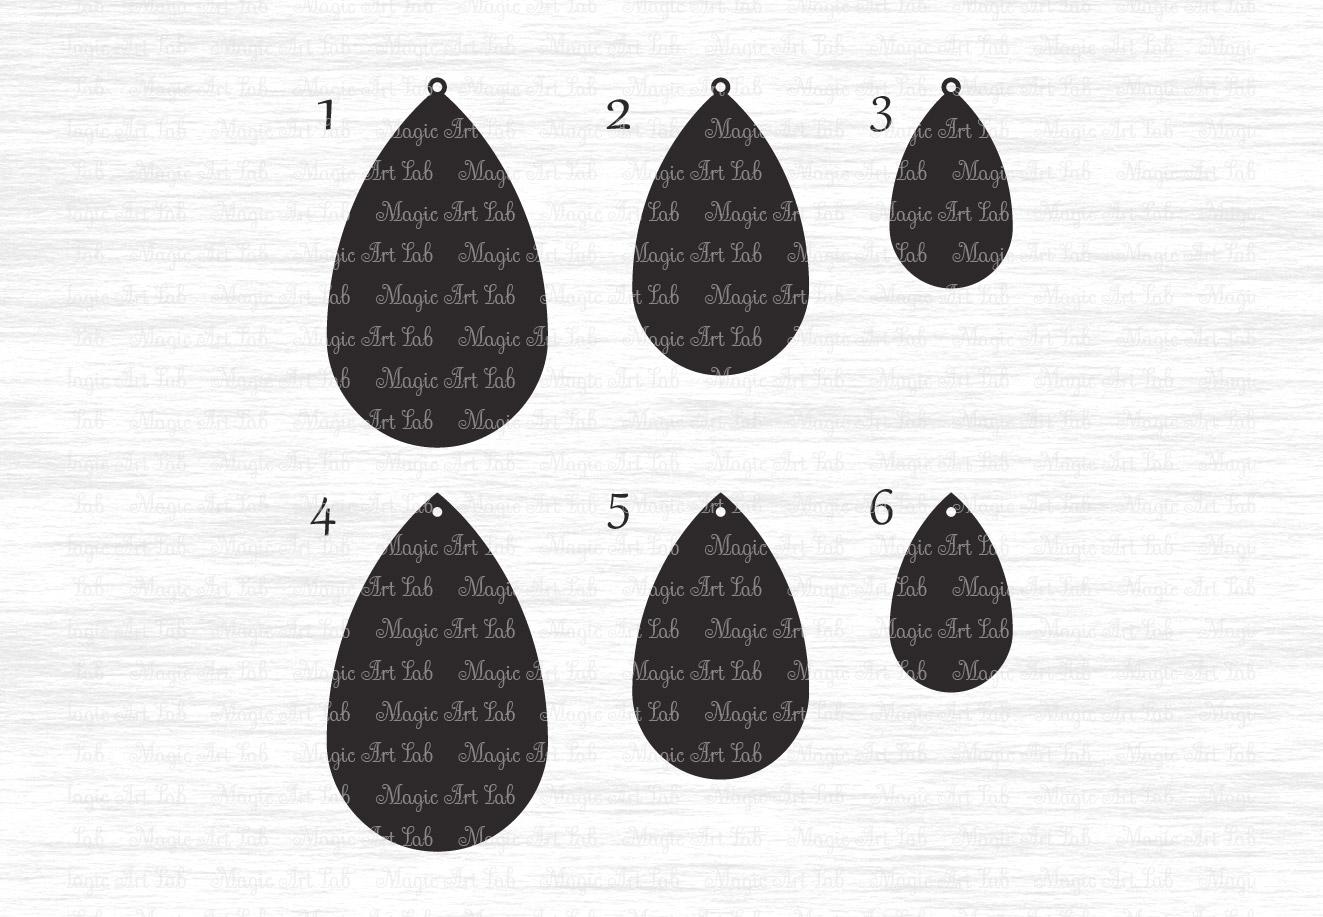 cb29e1978 Stacked earrings svg, Earring template cut file, Drop earrings svg, Pendant  svg,